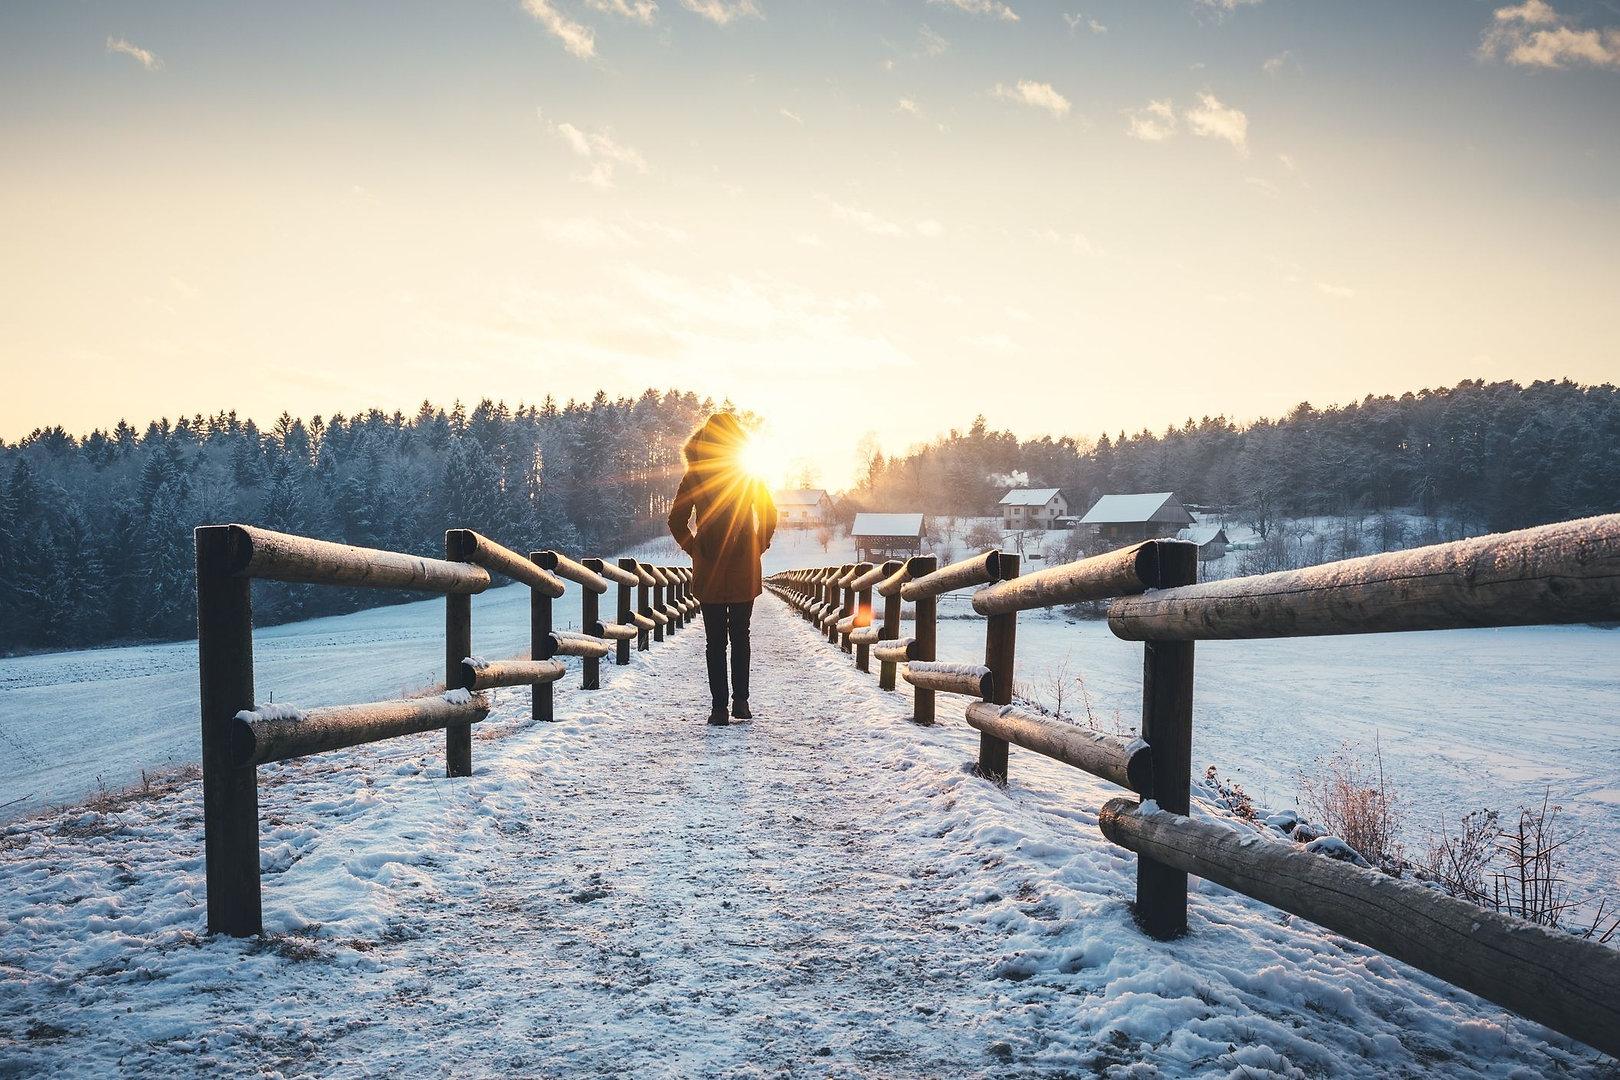 winter-walk-royalty-free-image-160554470